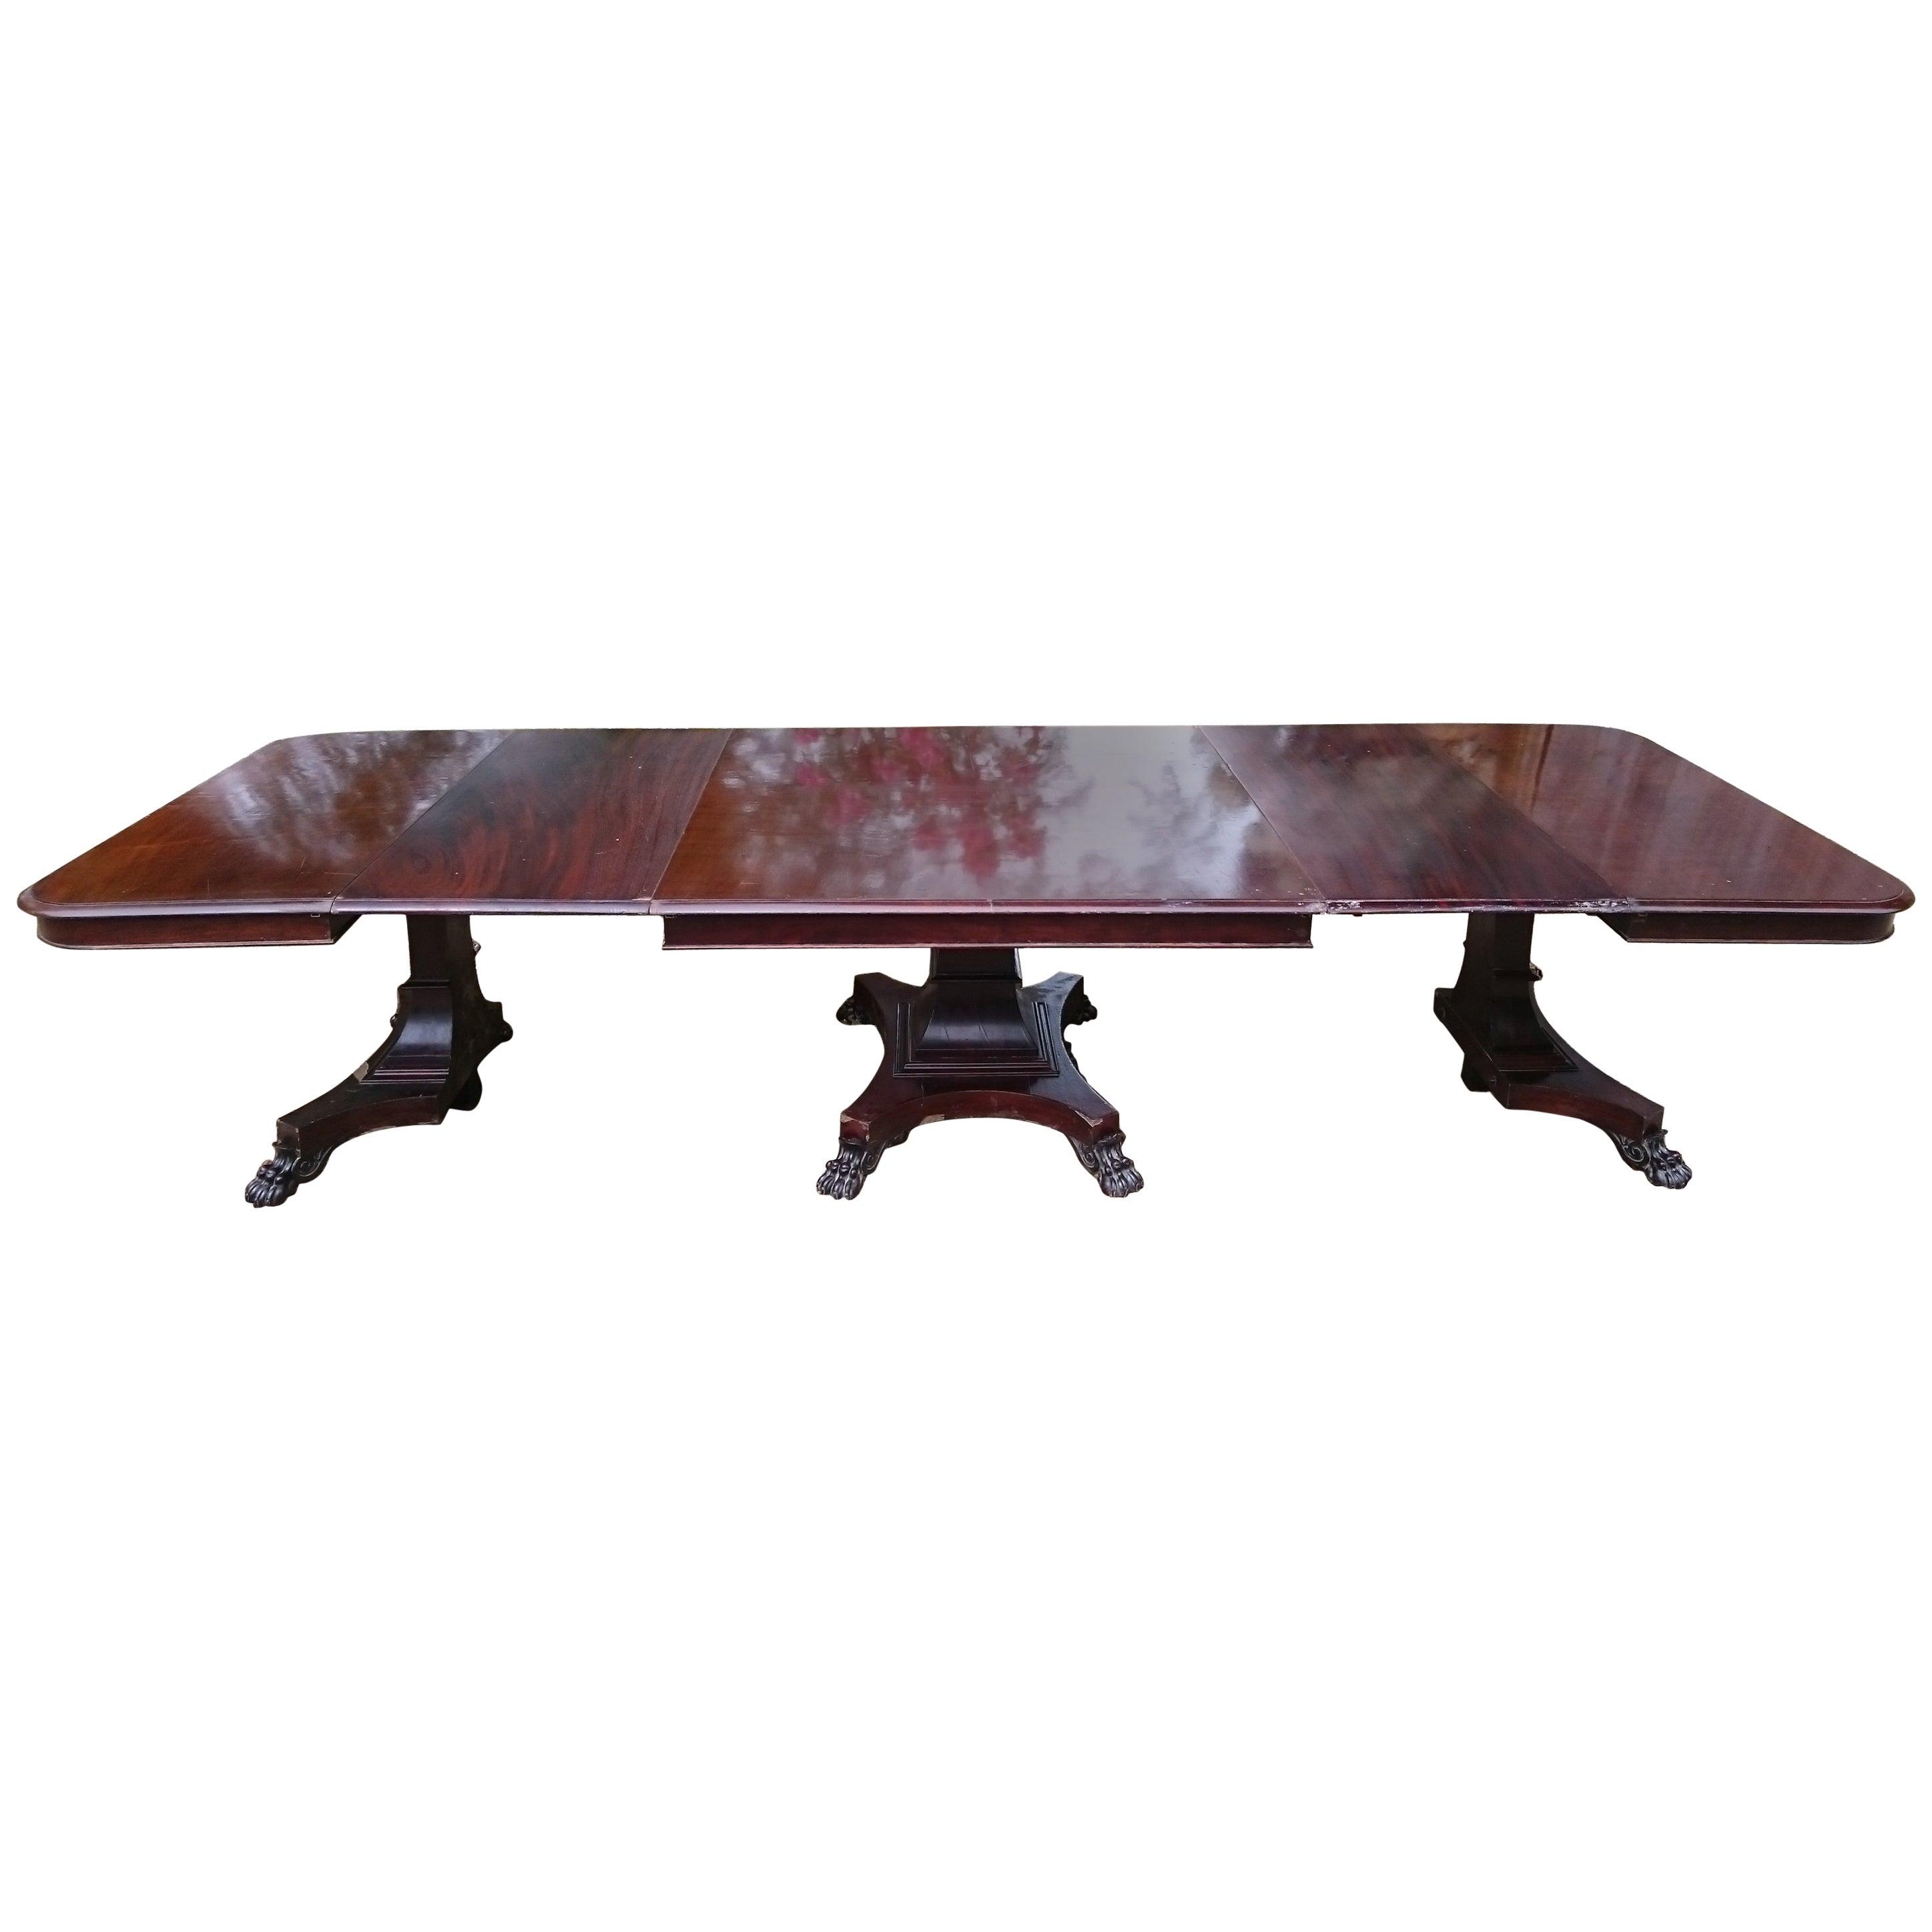 19th Century Mahogany Three Pedestal Dining Table